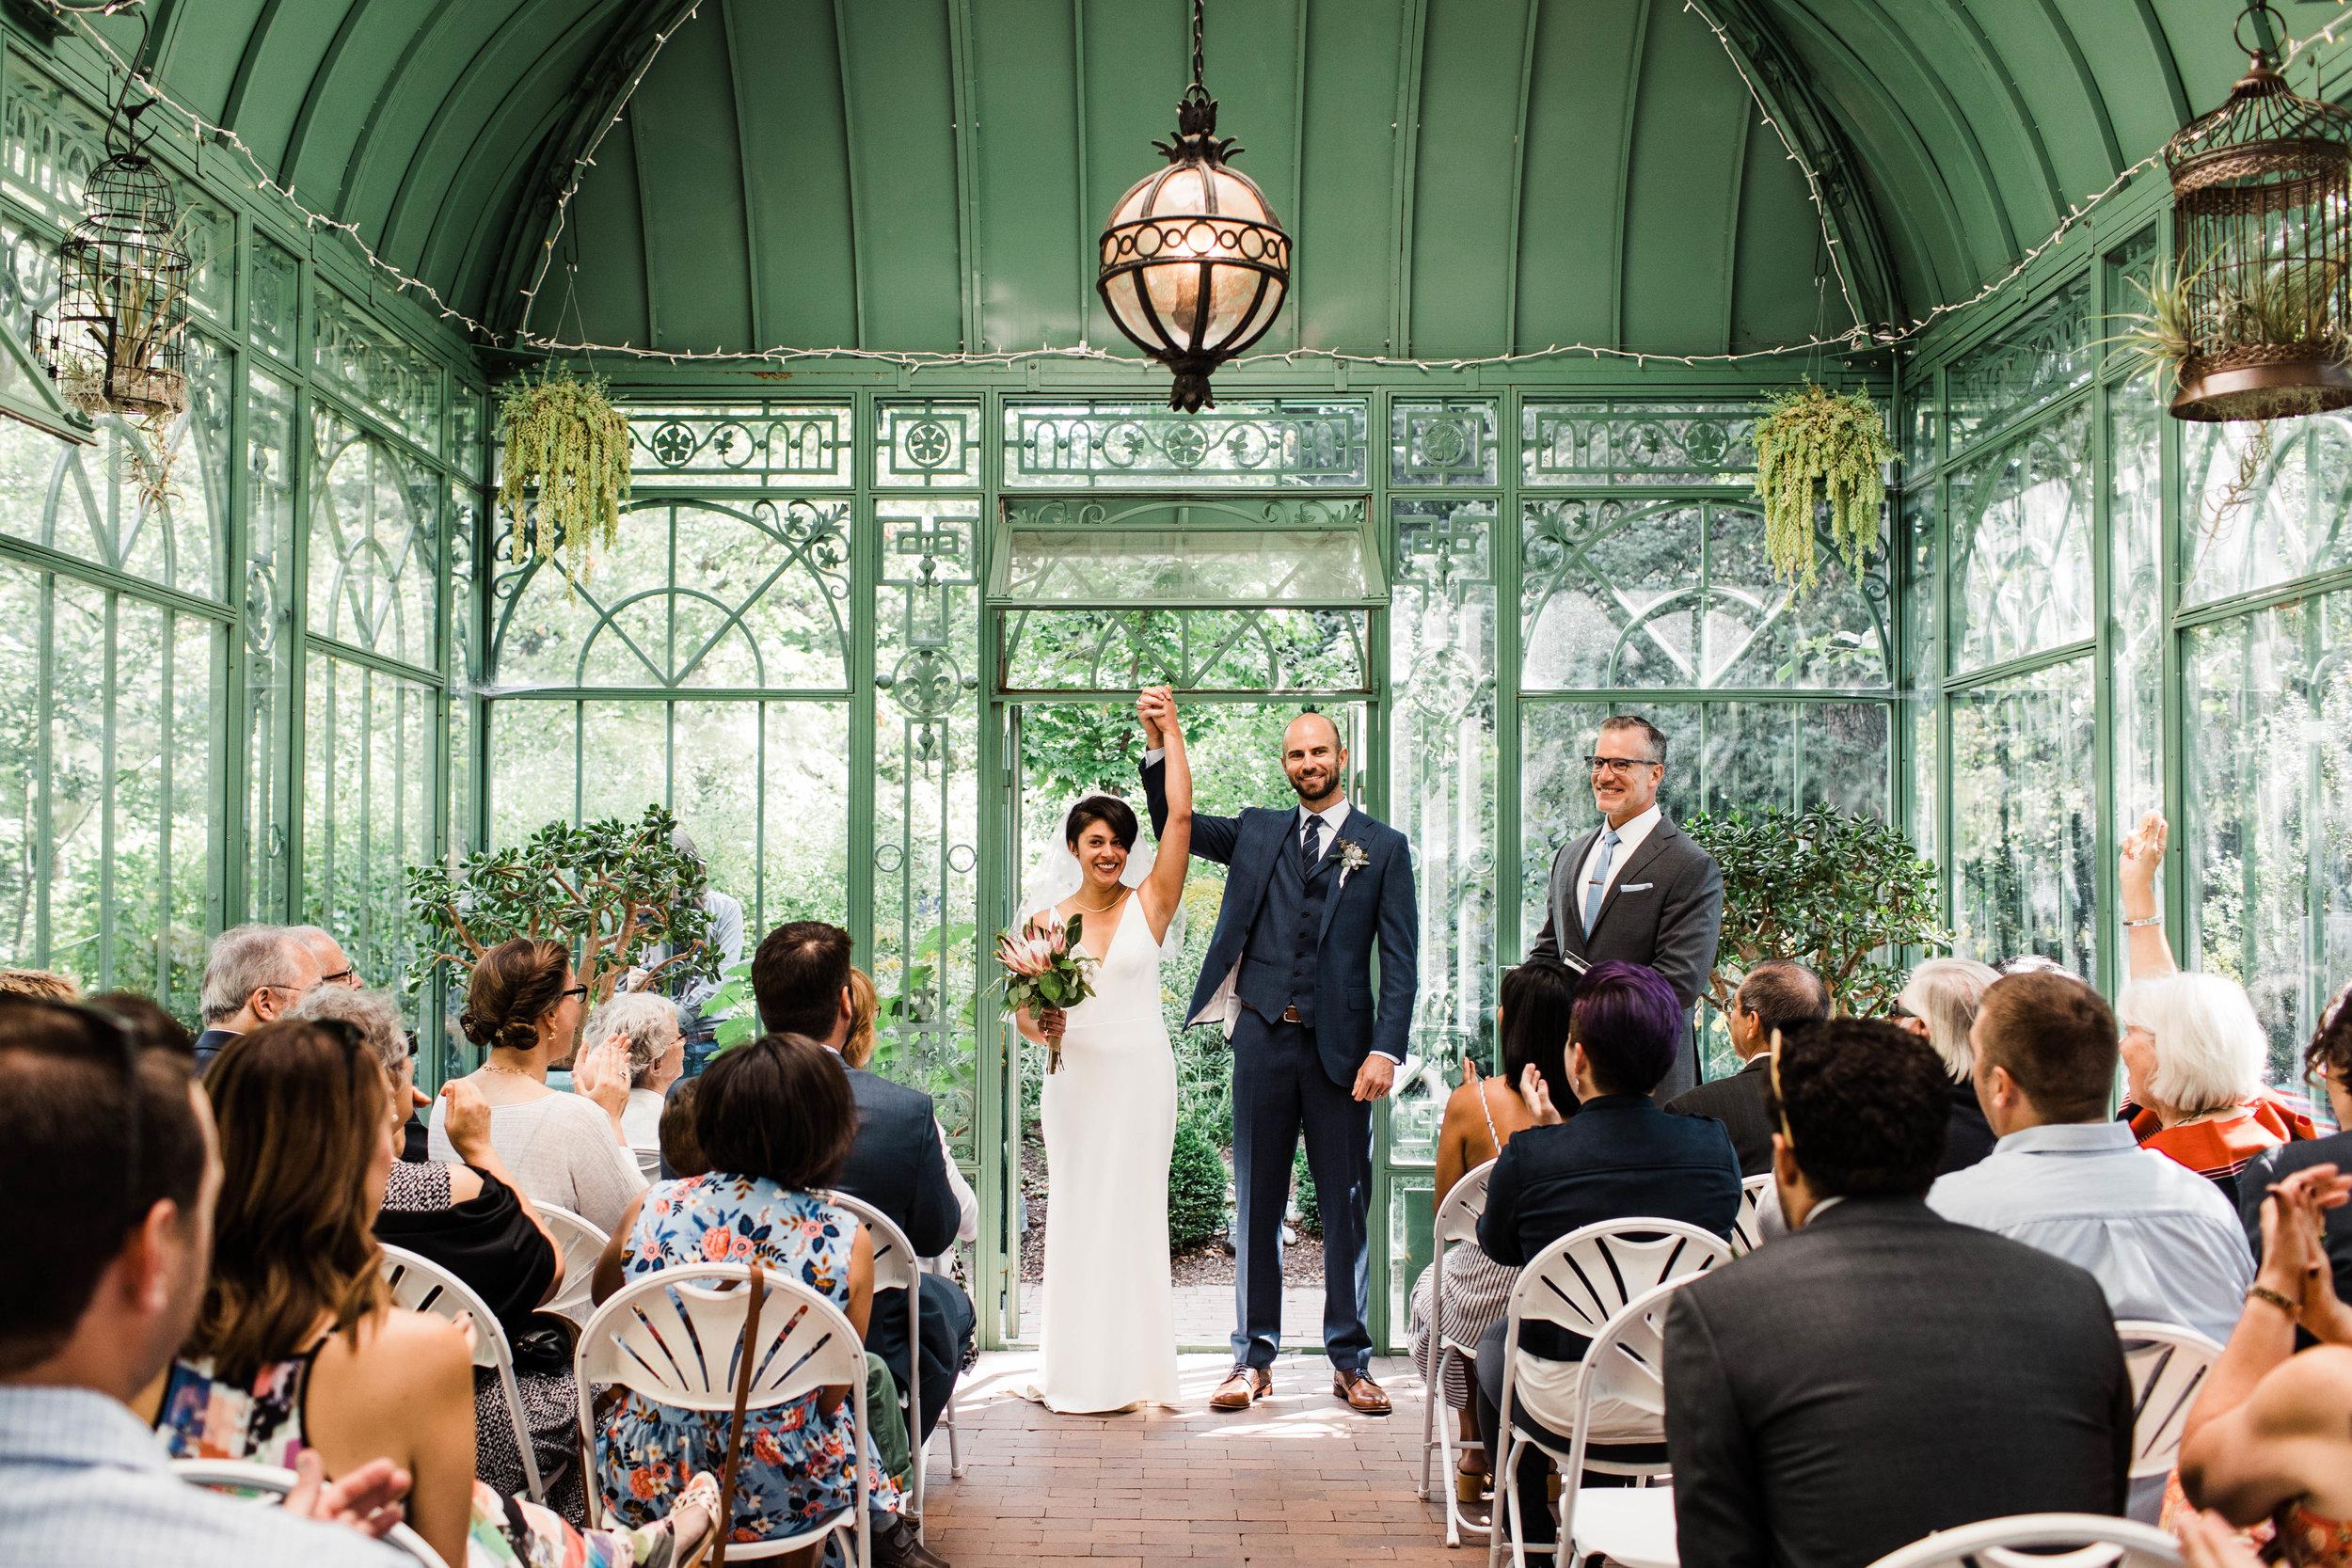 Intimate wedding at the Denver Botanic Gardens | Best Colorado wedding photographers